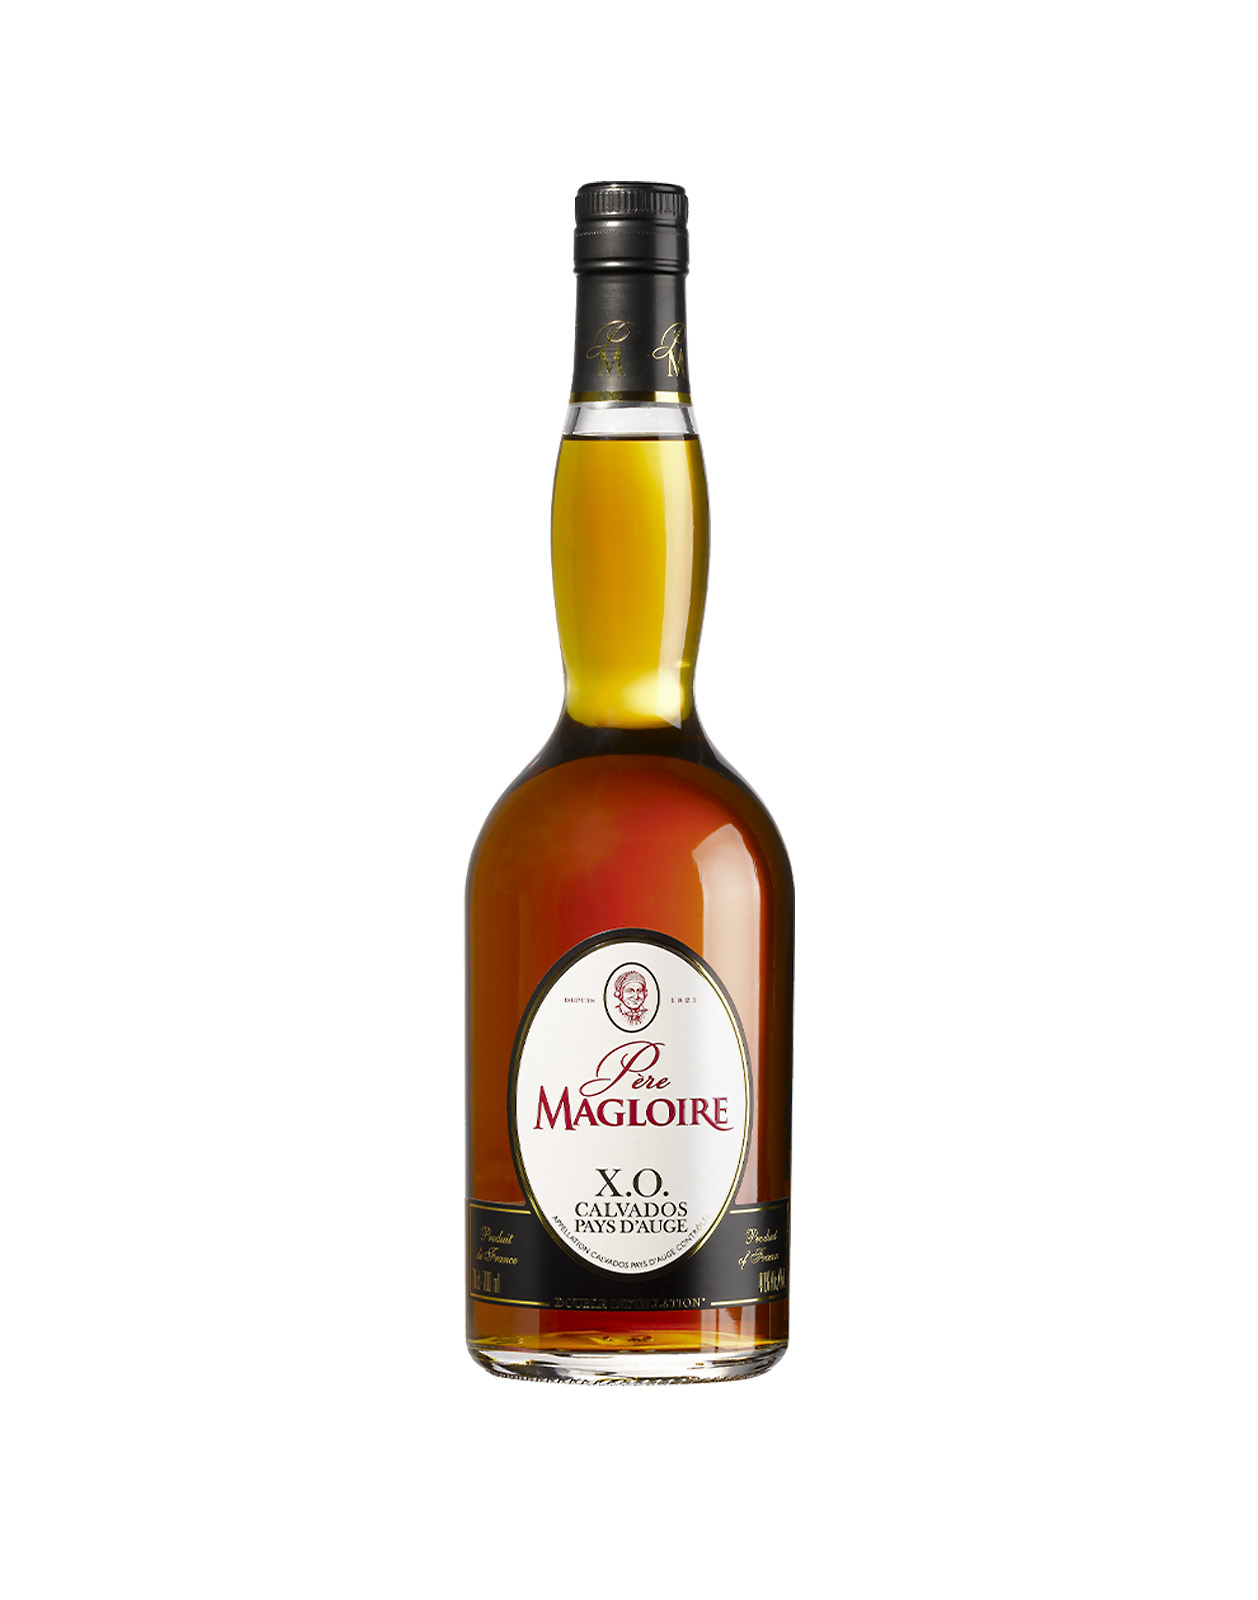 Pére Magloire calvados VSOP 0,7L 40% destiláty calvados, Bottleshop Sunny wines slnecnice mesto, petrzalka, destiláty, rozvoz alkoholu, eshop